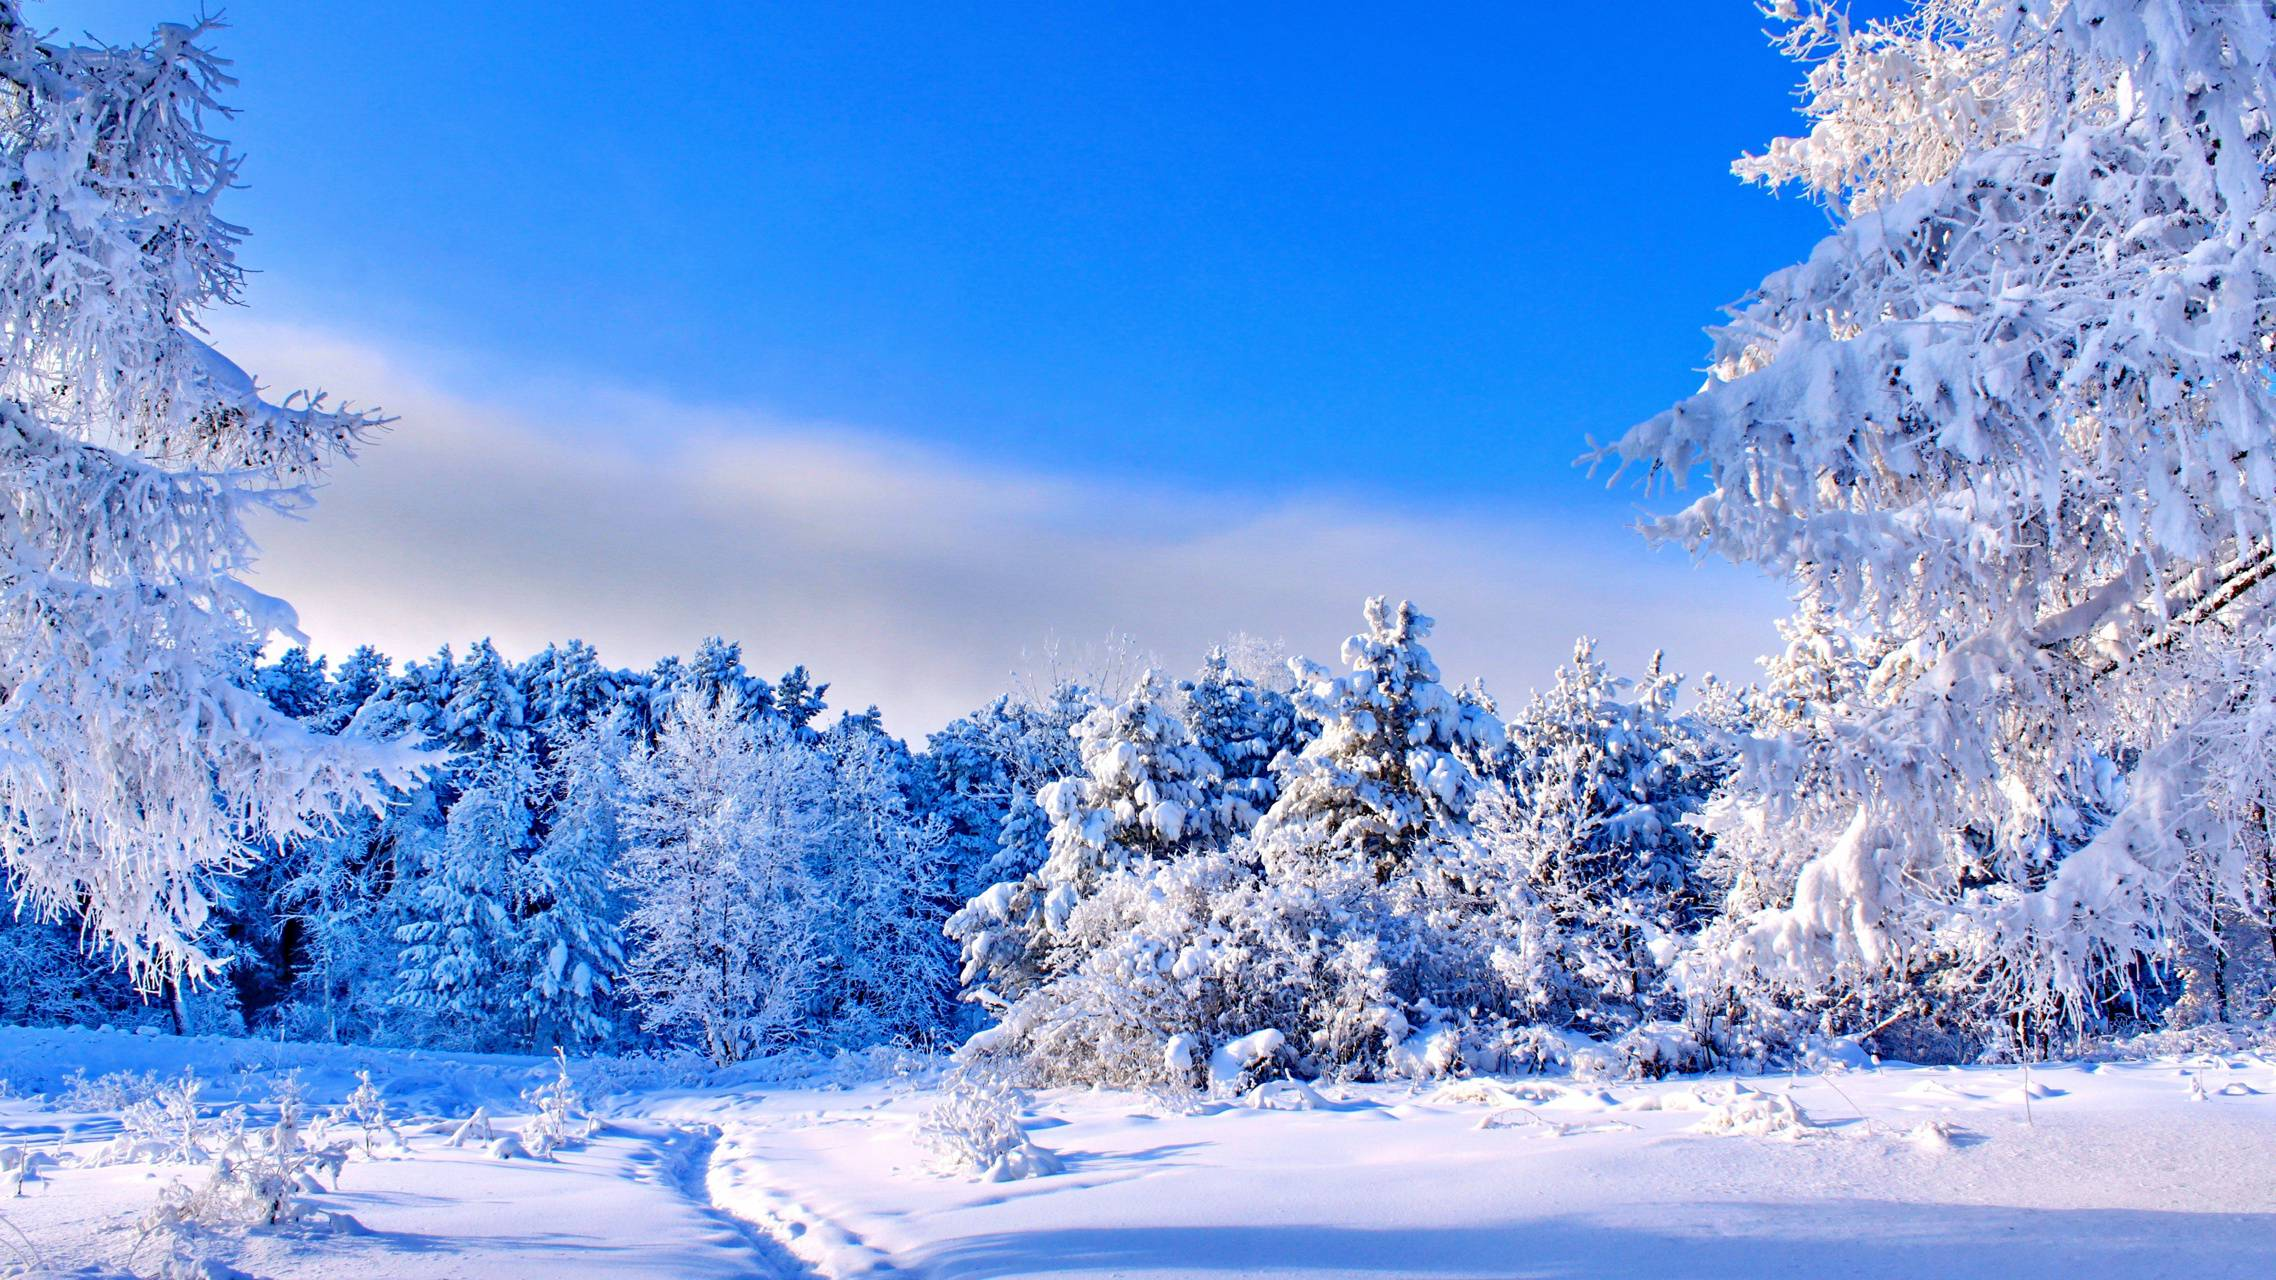 sky and snow